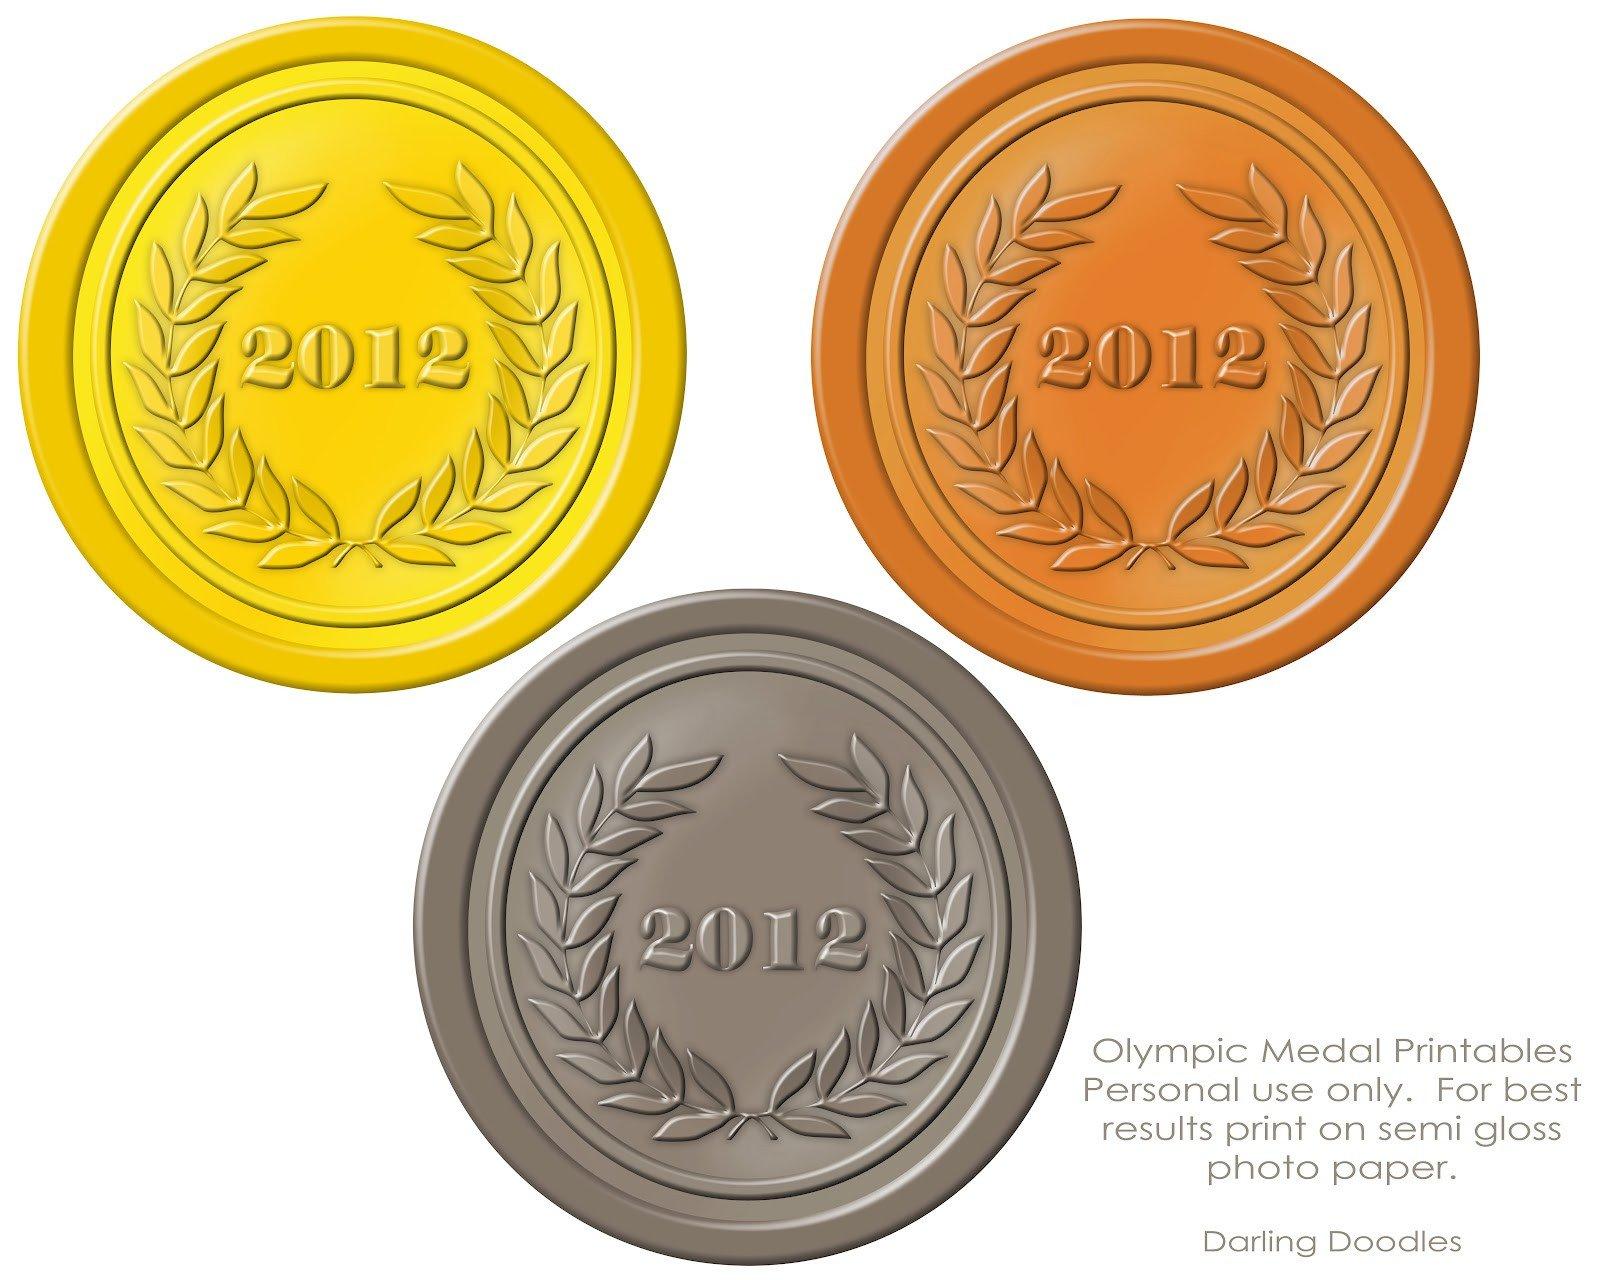 Gold Medal Printable Olympic Printables Darling Doodles